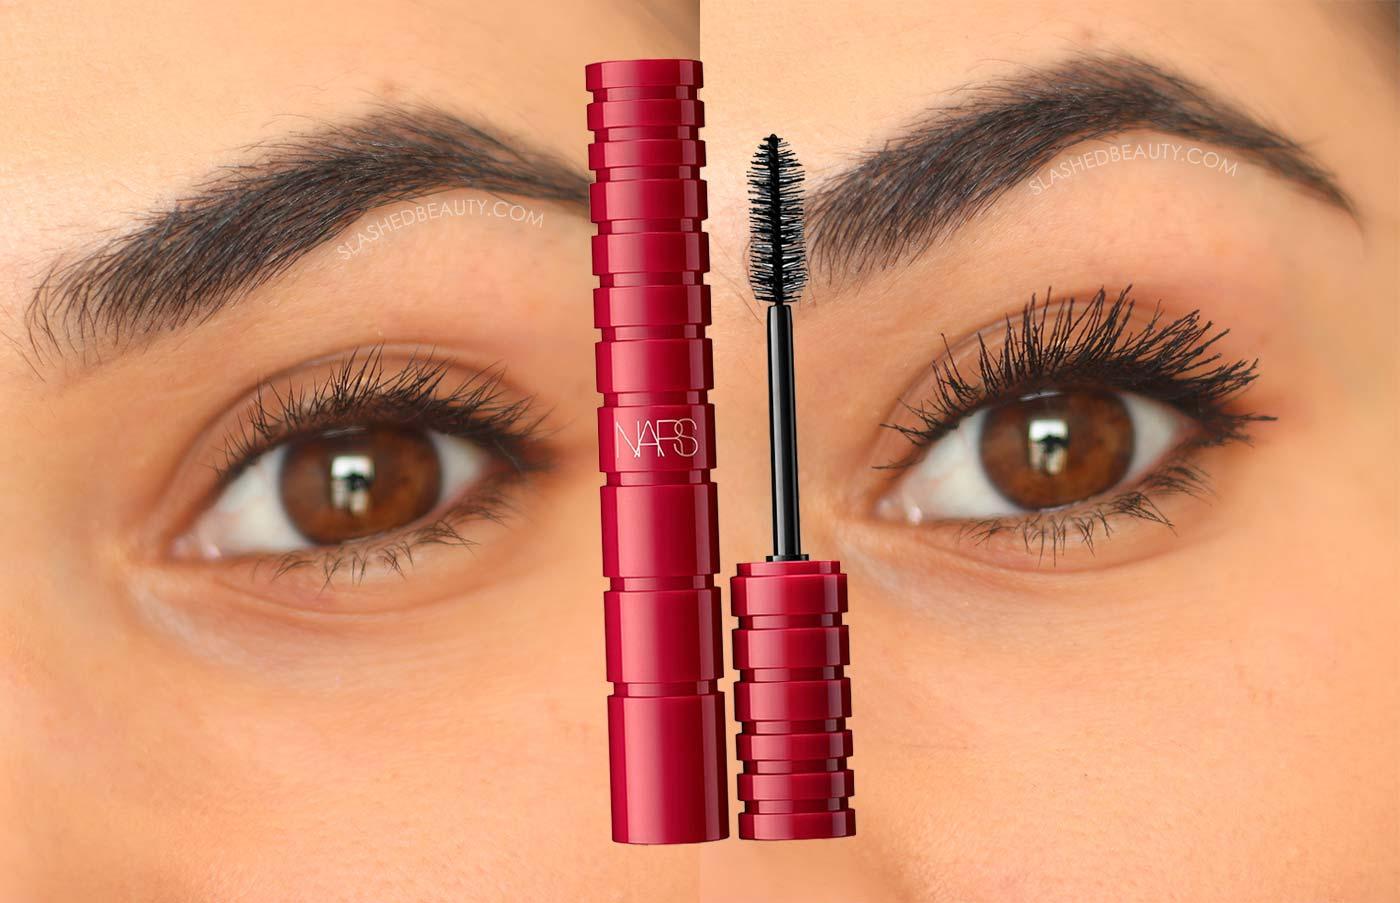 NARS Climax Mascara Before & After | NARS Climax Mascara Dupe | Slashed Beauty